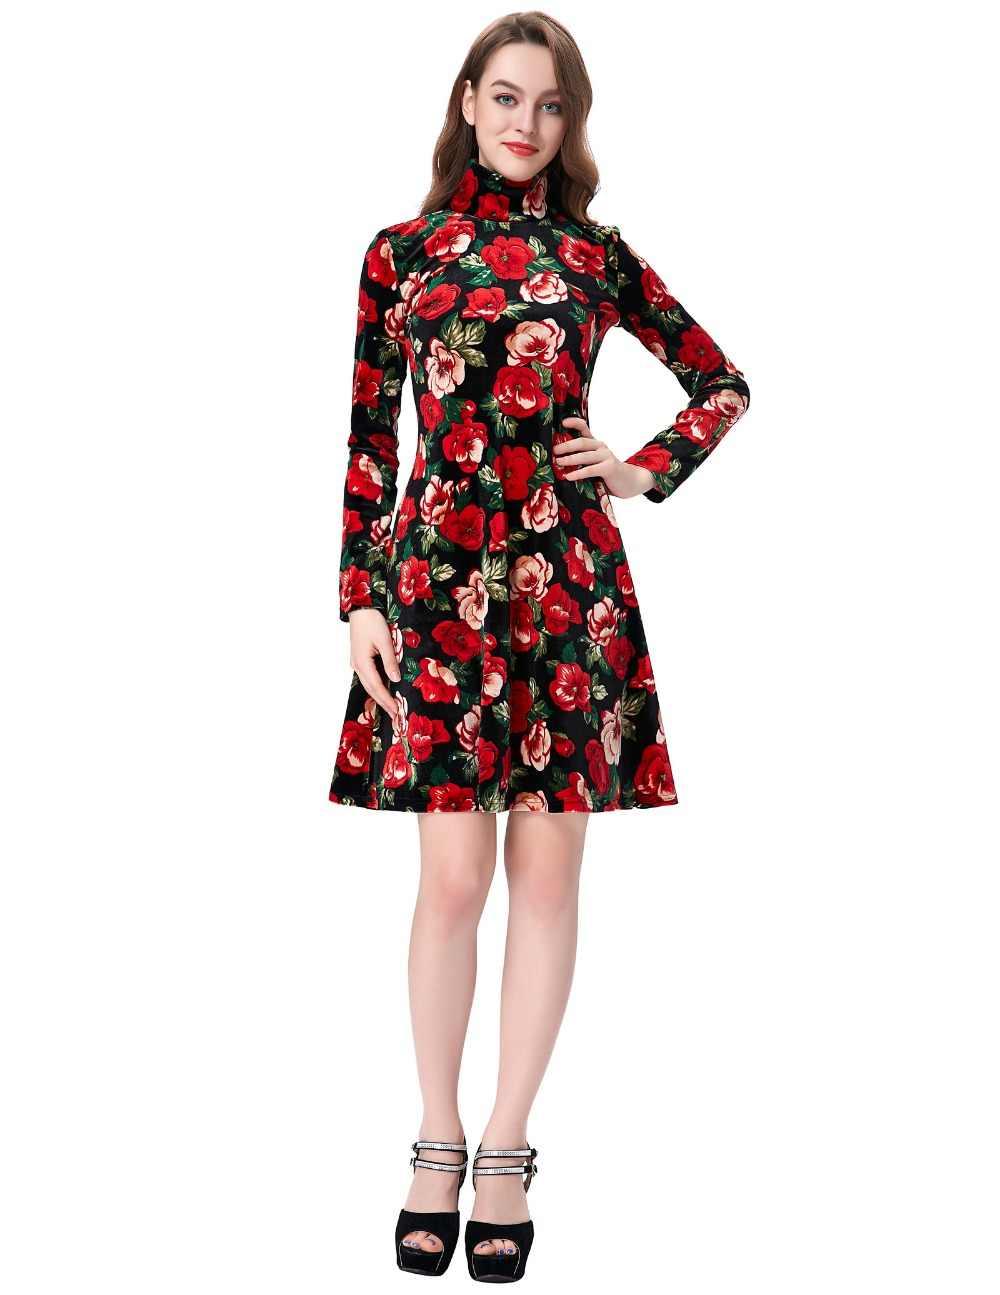 52a35c71ecf06 ... Vintage Autumn dresses Plus Size clothing winter Print vestidos  femininos casual Office dress Long sleeve Women ...